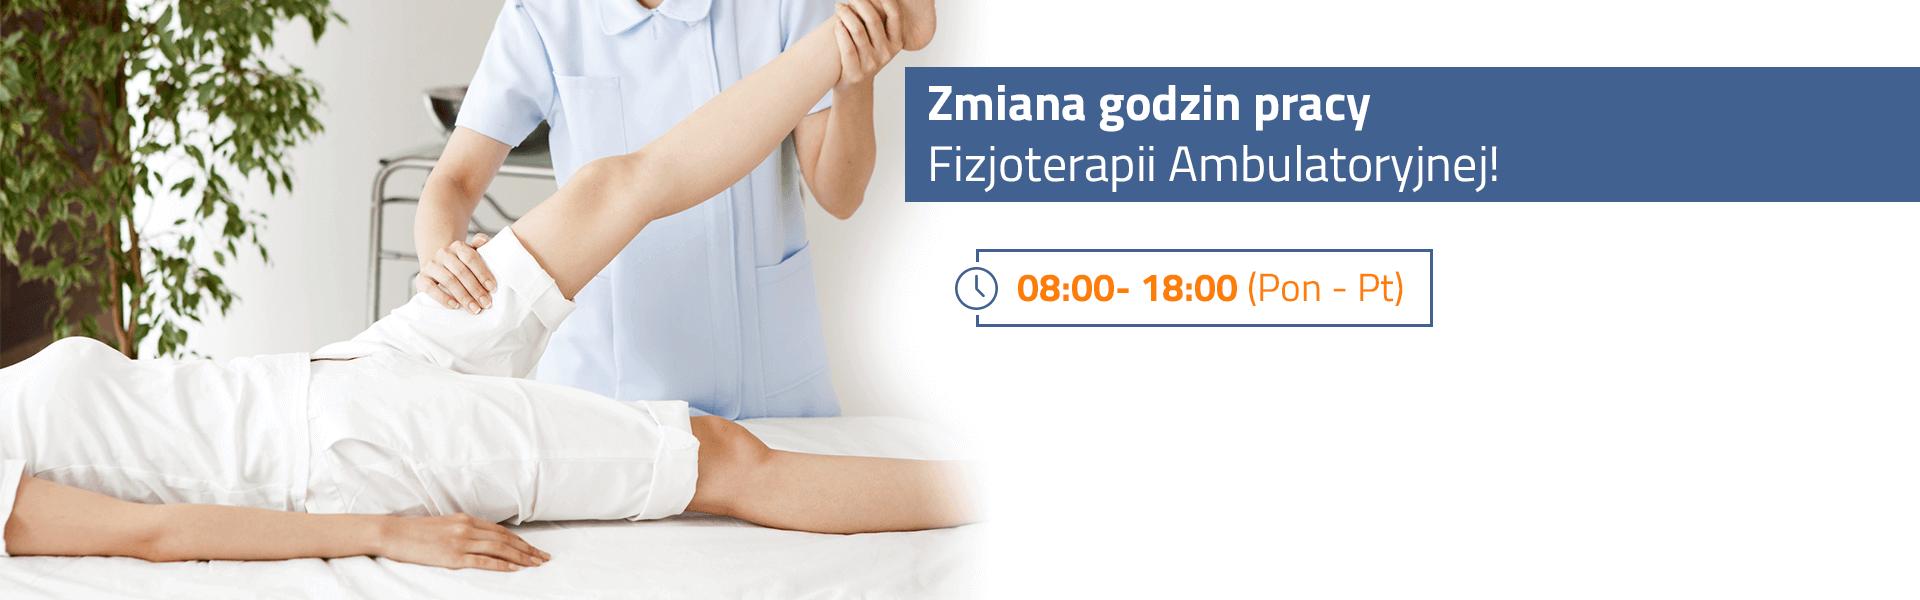 Medicamed Fizjoterapii Ambulatoryjnej! slider (2)